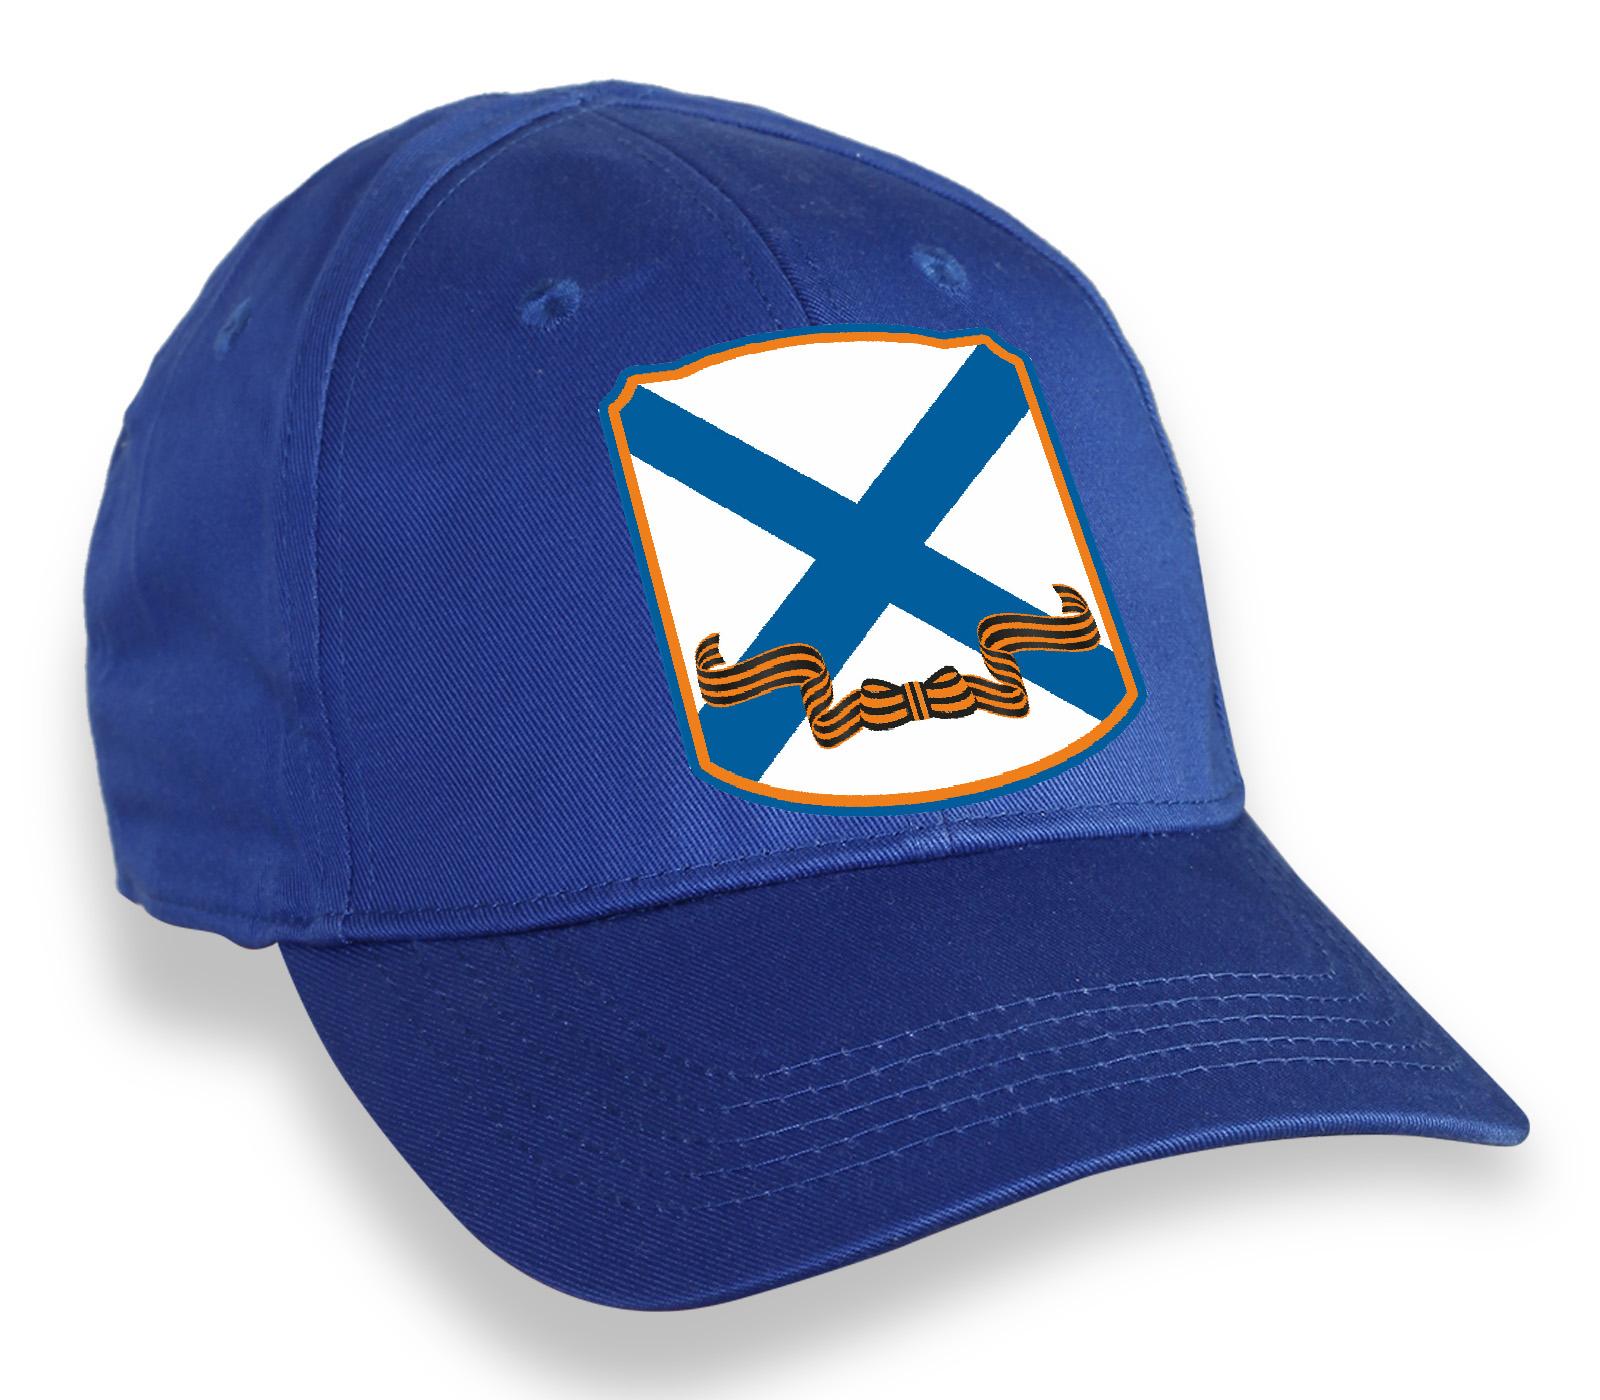 Синяя бейсболка Андреевский гвардейский флаг